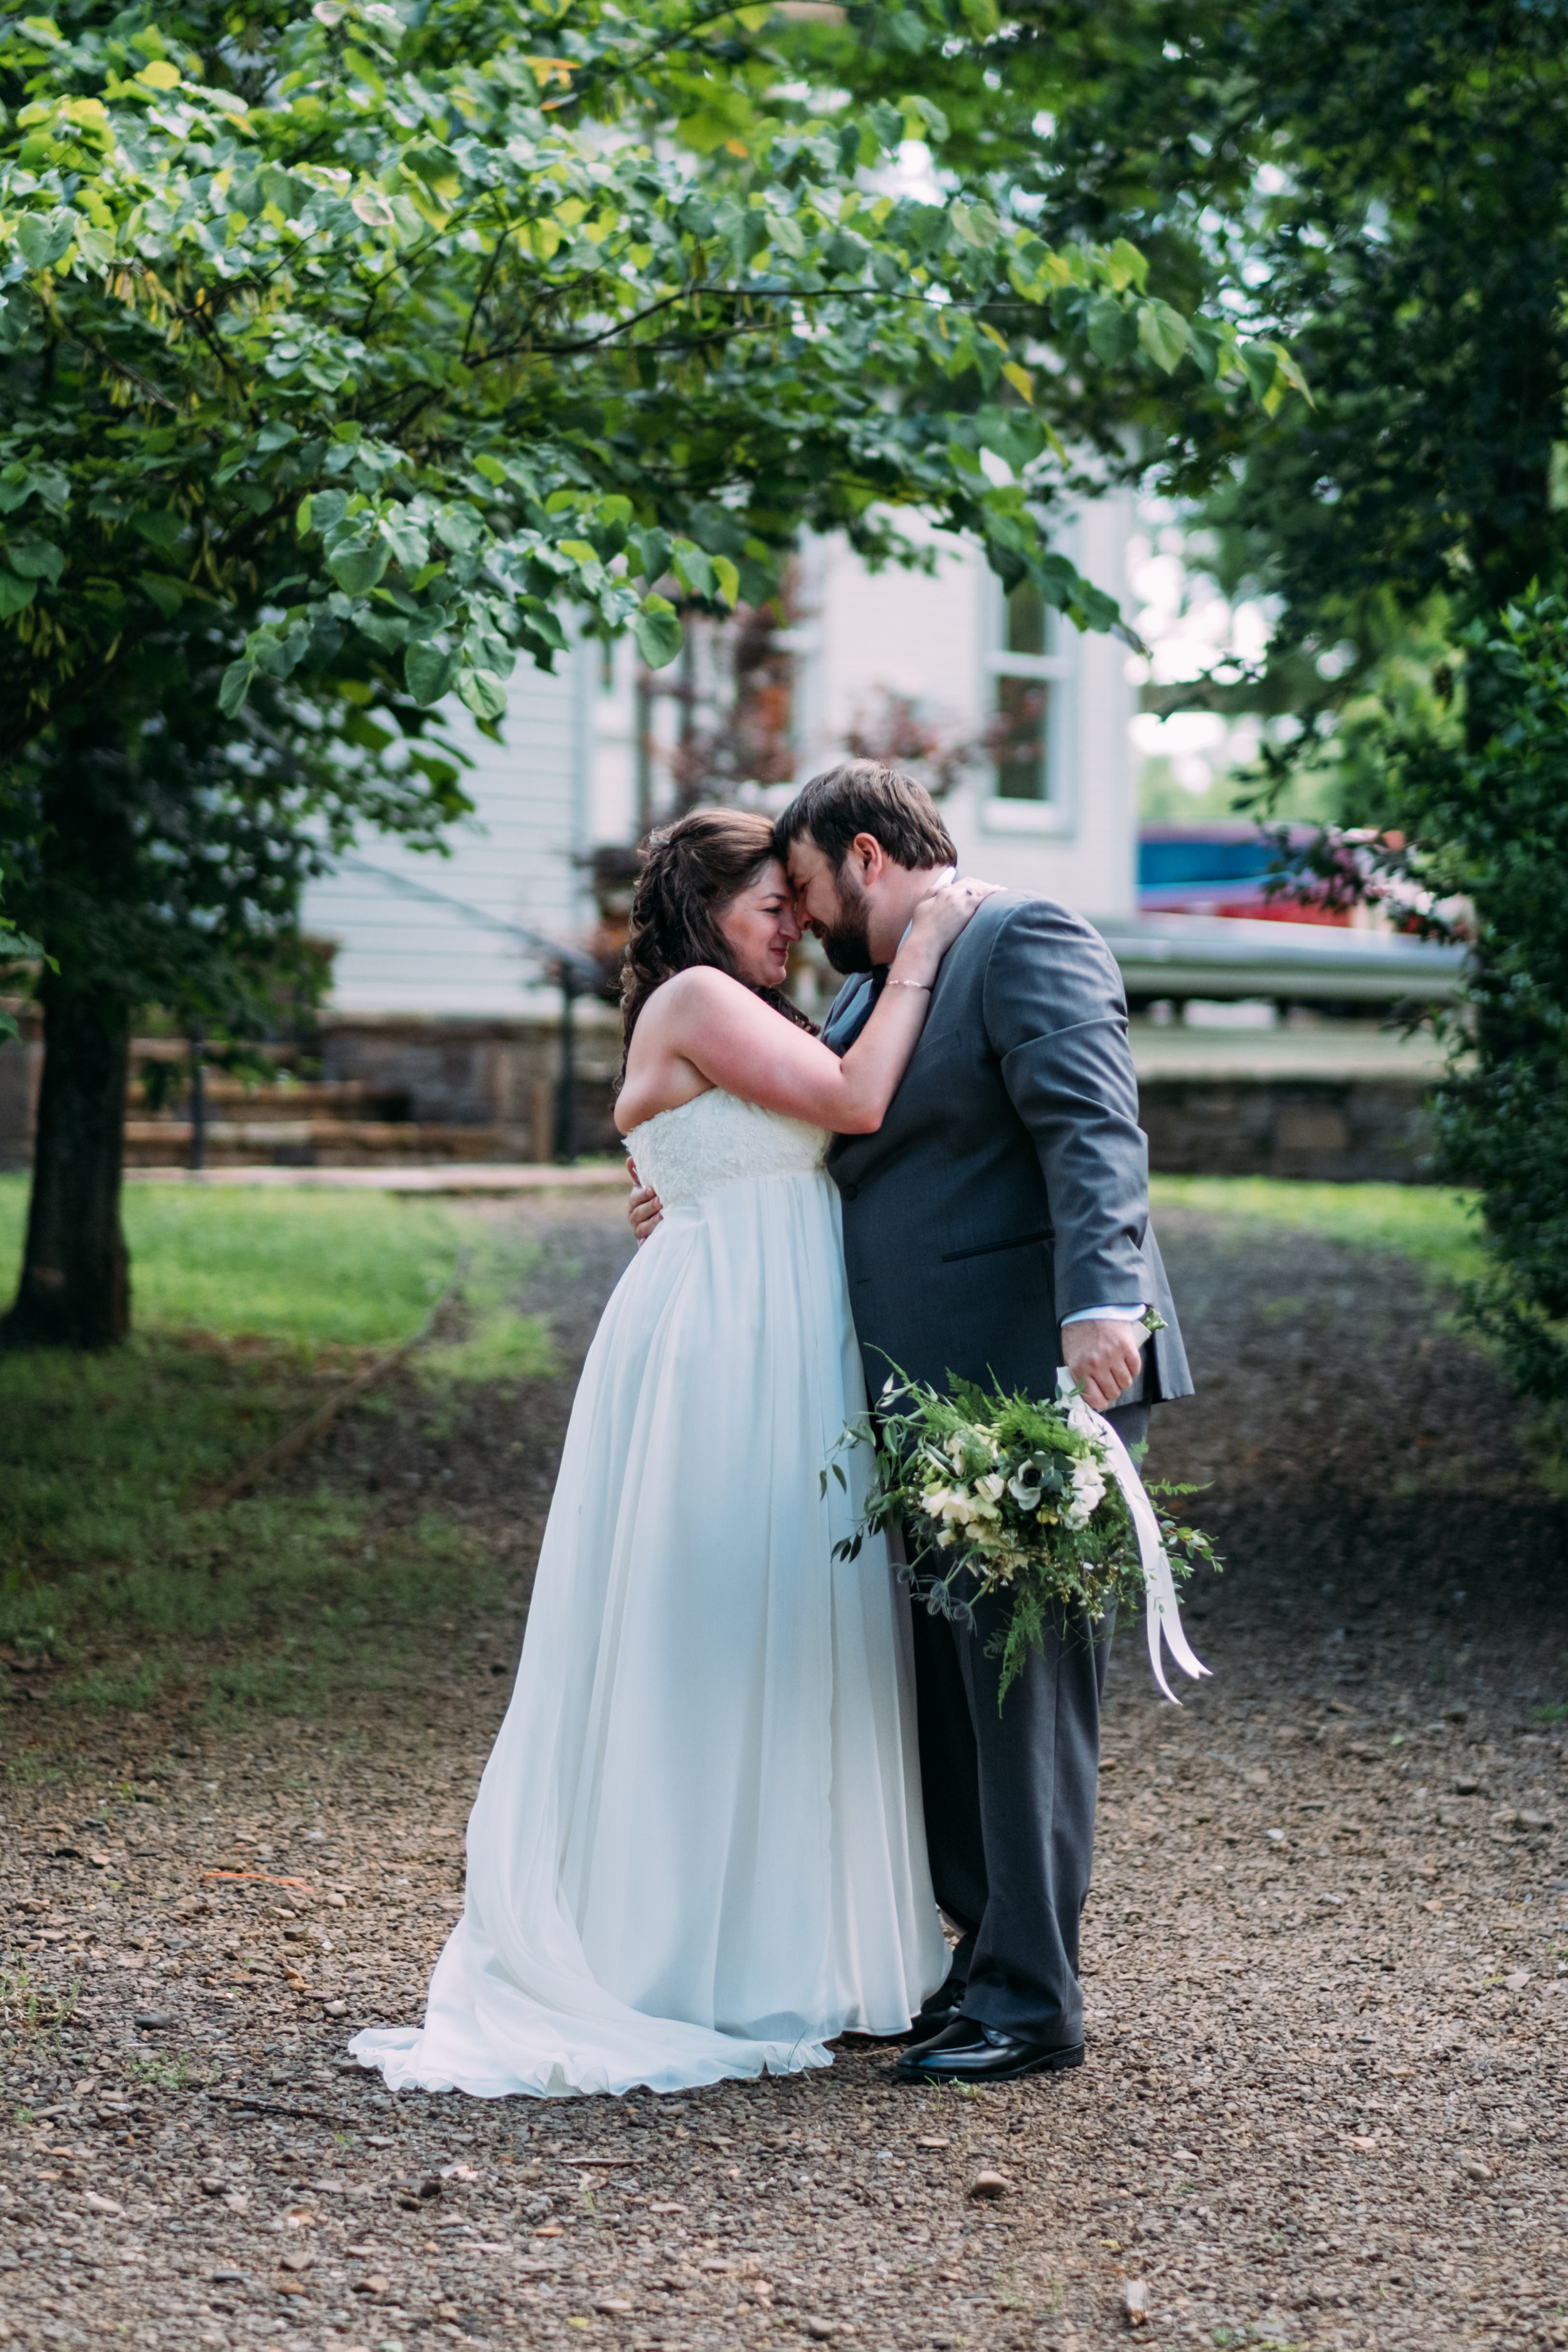 Ashley.Eric.Wedding.Delyn.2016.Mileswittboyer.Photographiccollective-243.jpg